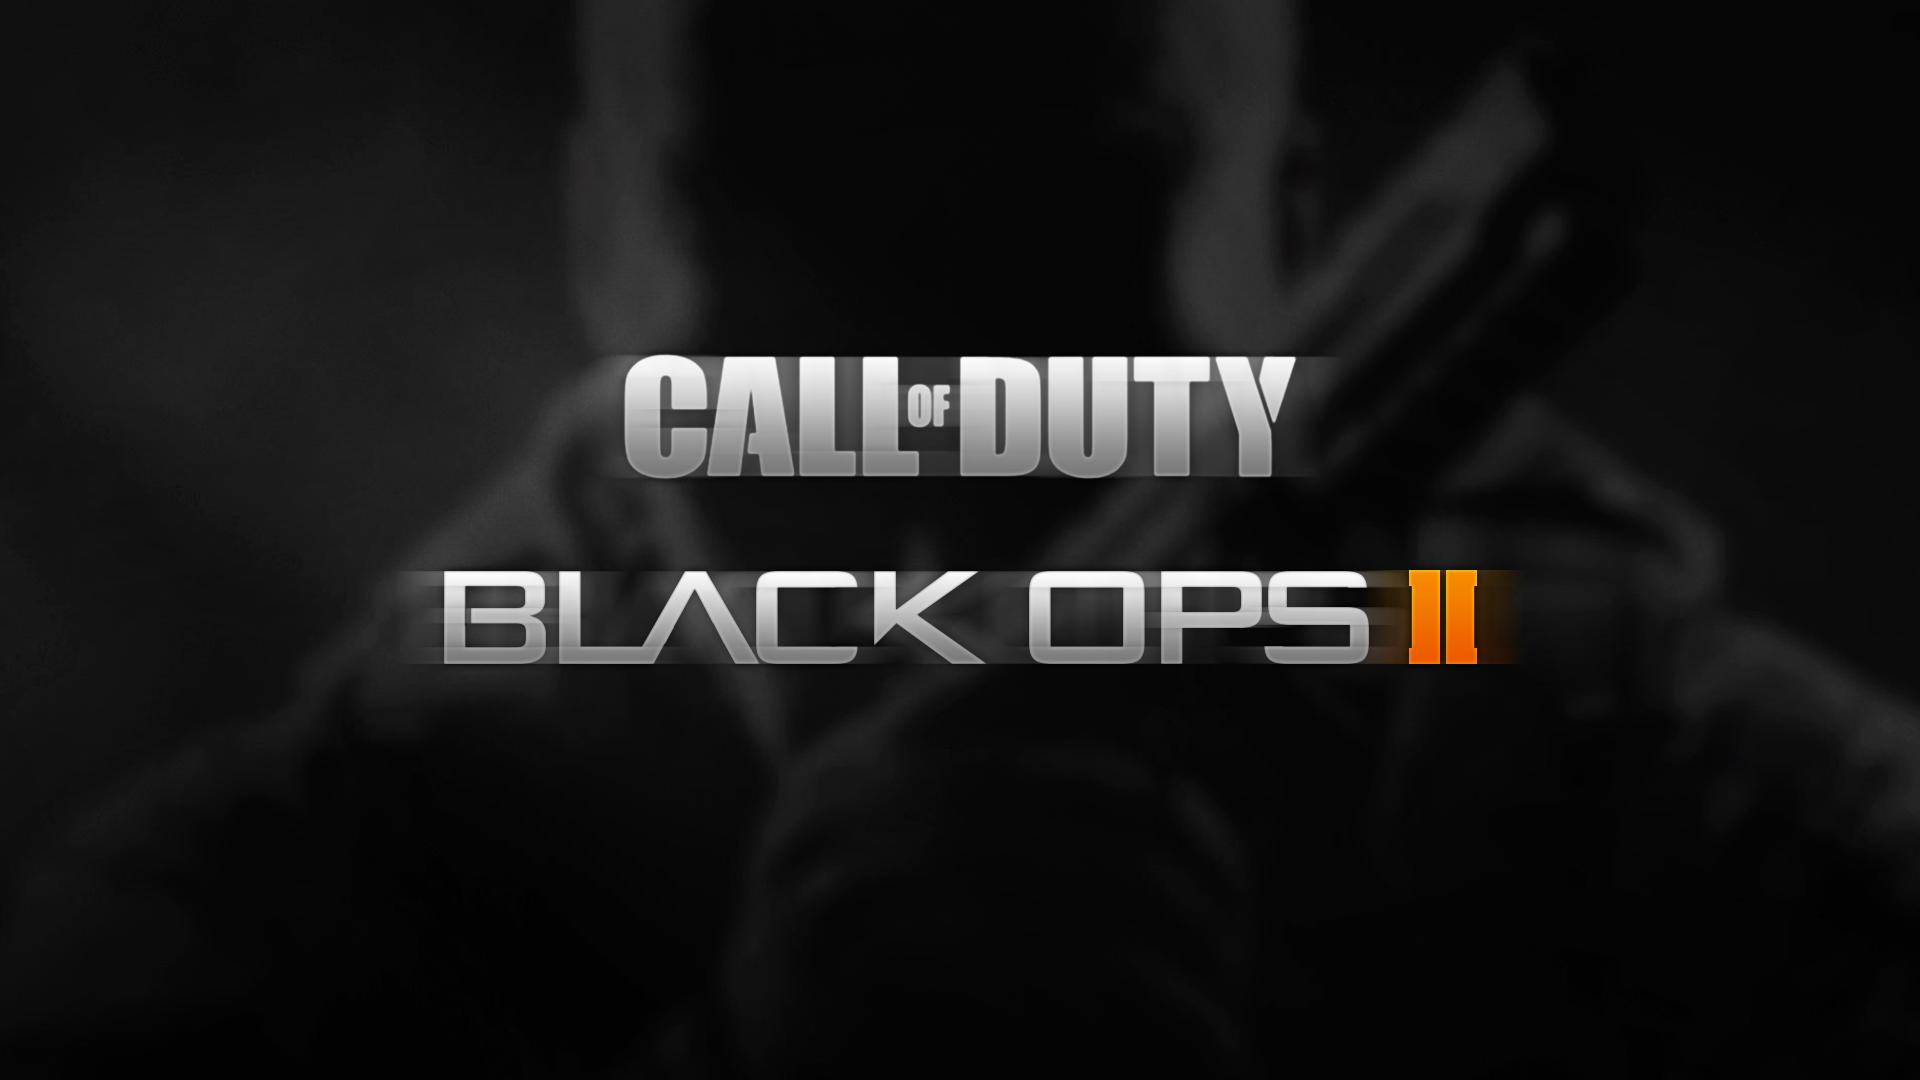 Купить Call Of Duty: Black Ops 2 Steam аккаунт + подарок